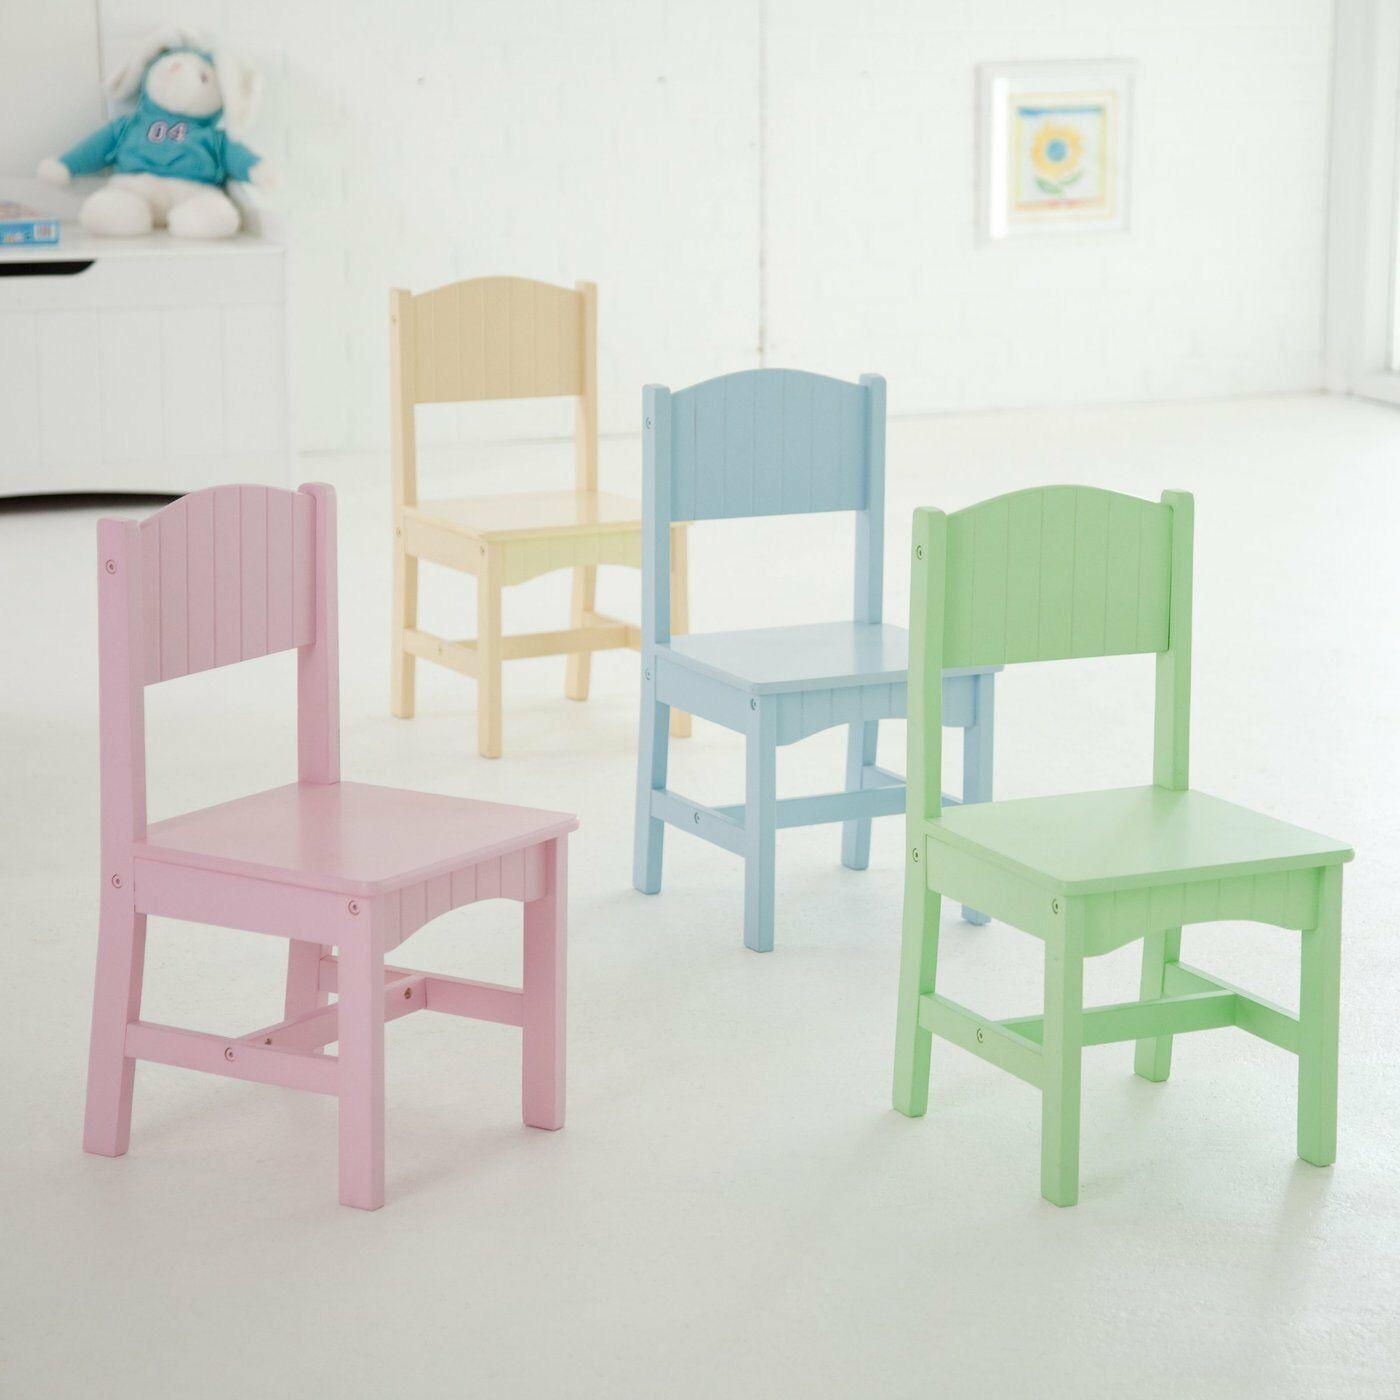 White Kids Chair  Kids Table Chair Set 5 Piece Furniture Children Play Room